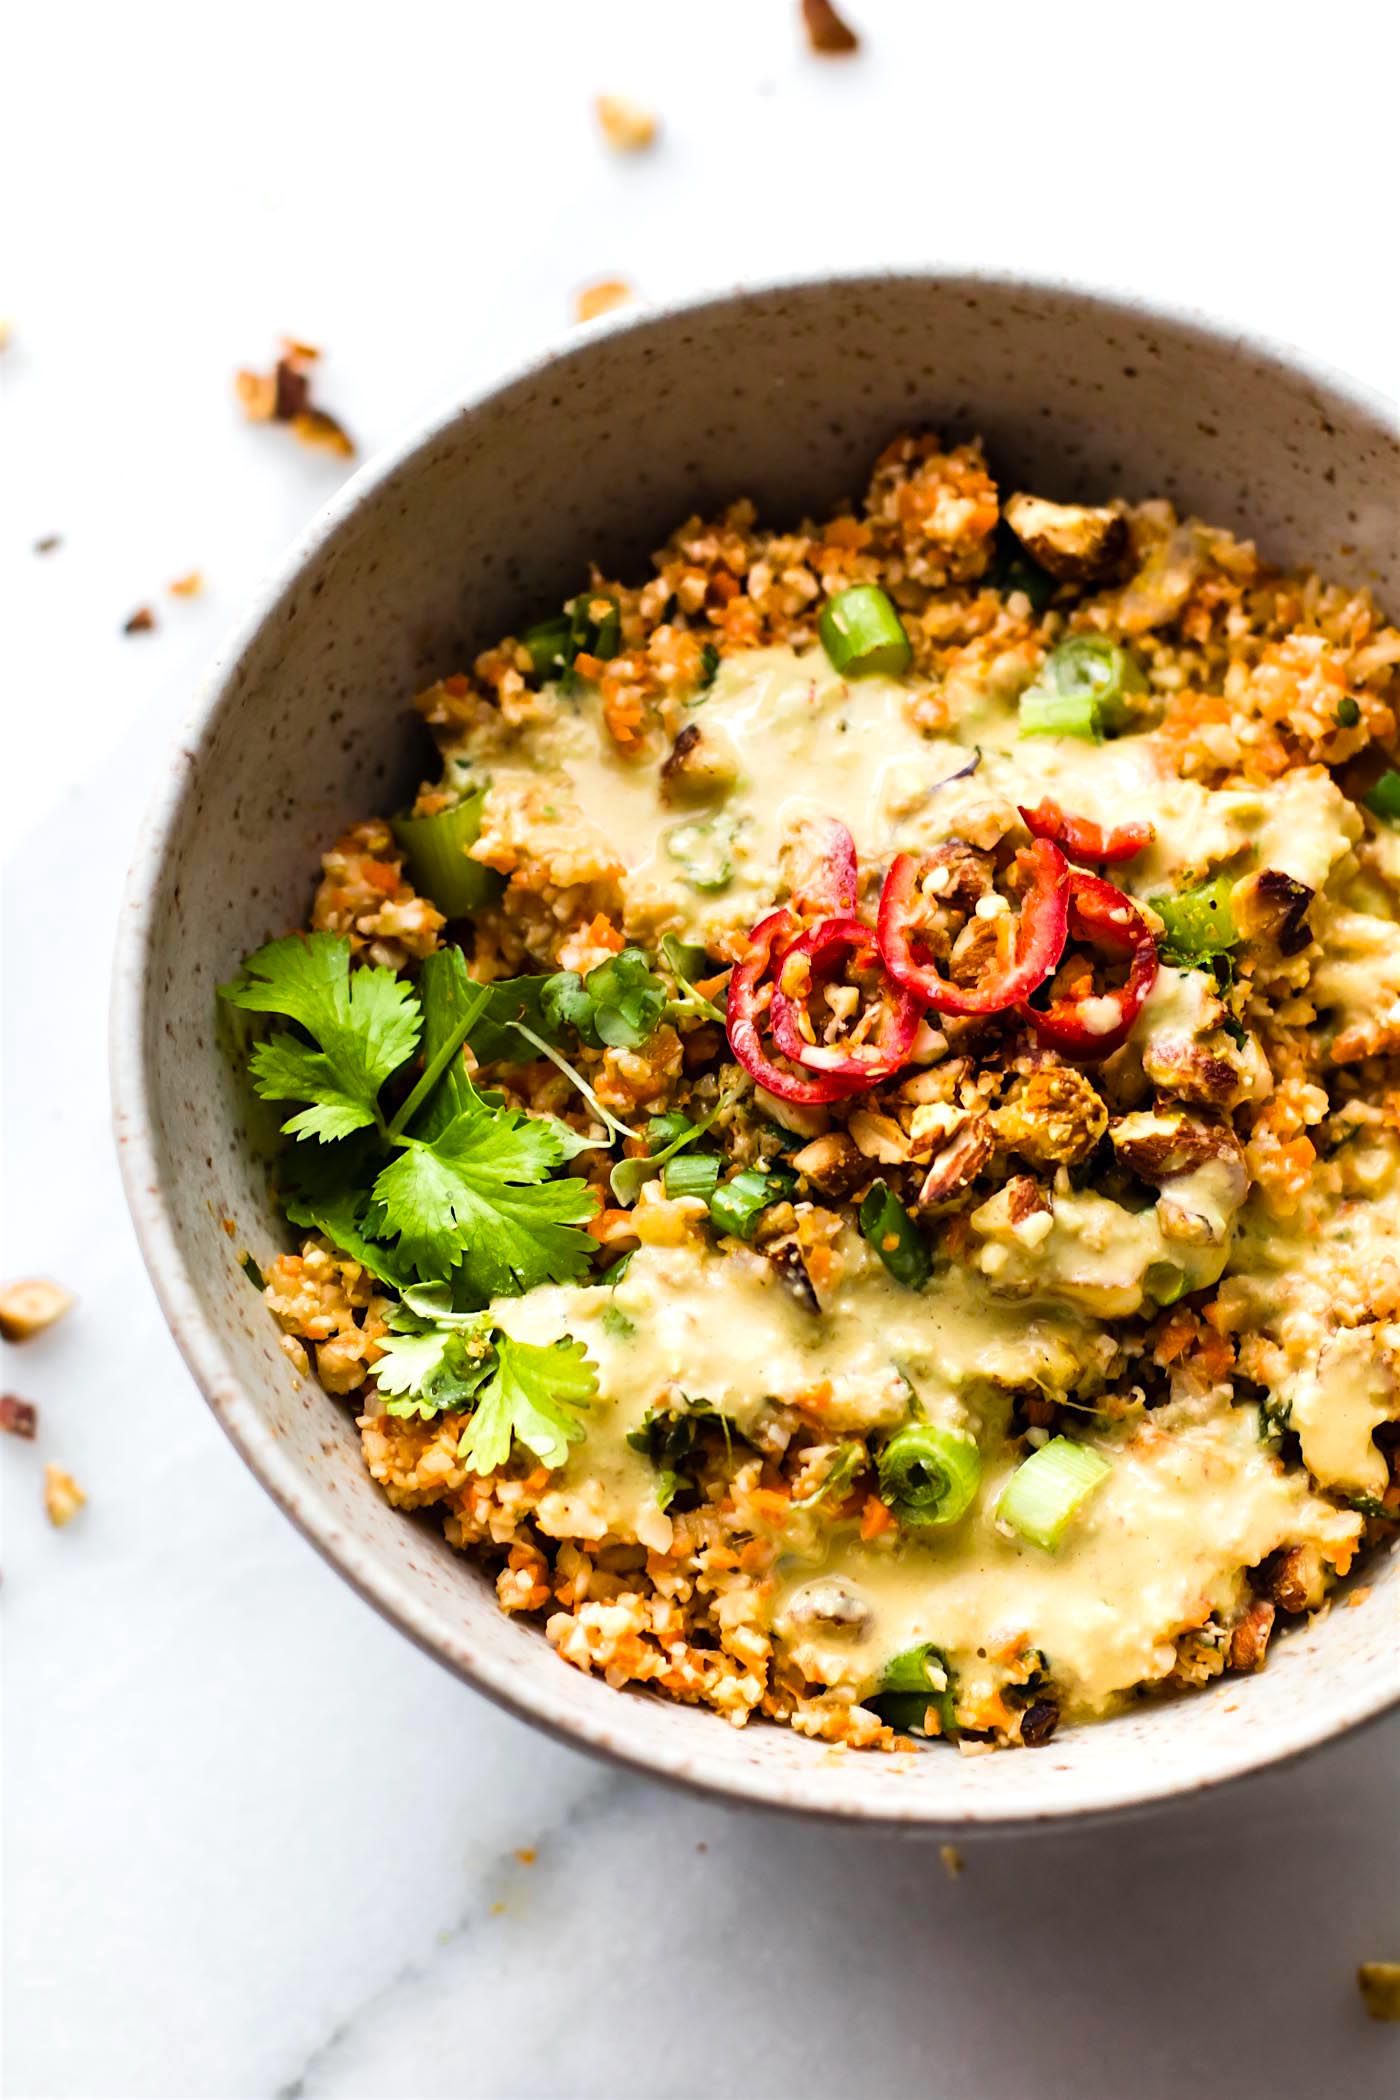 Thai Carrot Cauliflower Rice Salad With Avocado Cream Dressing Vegan Paleo